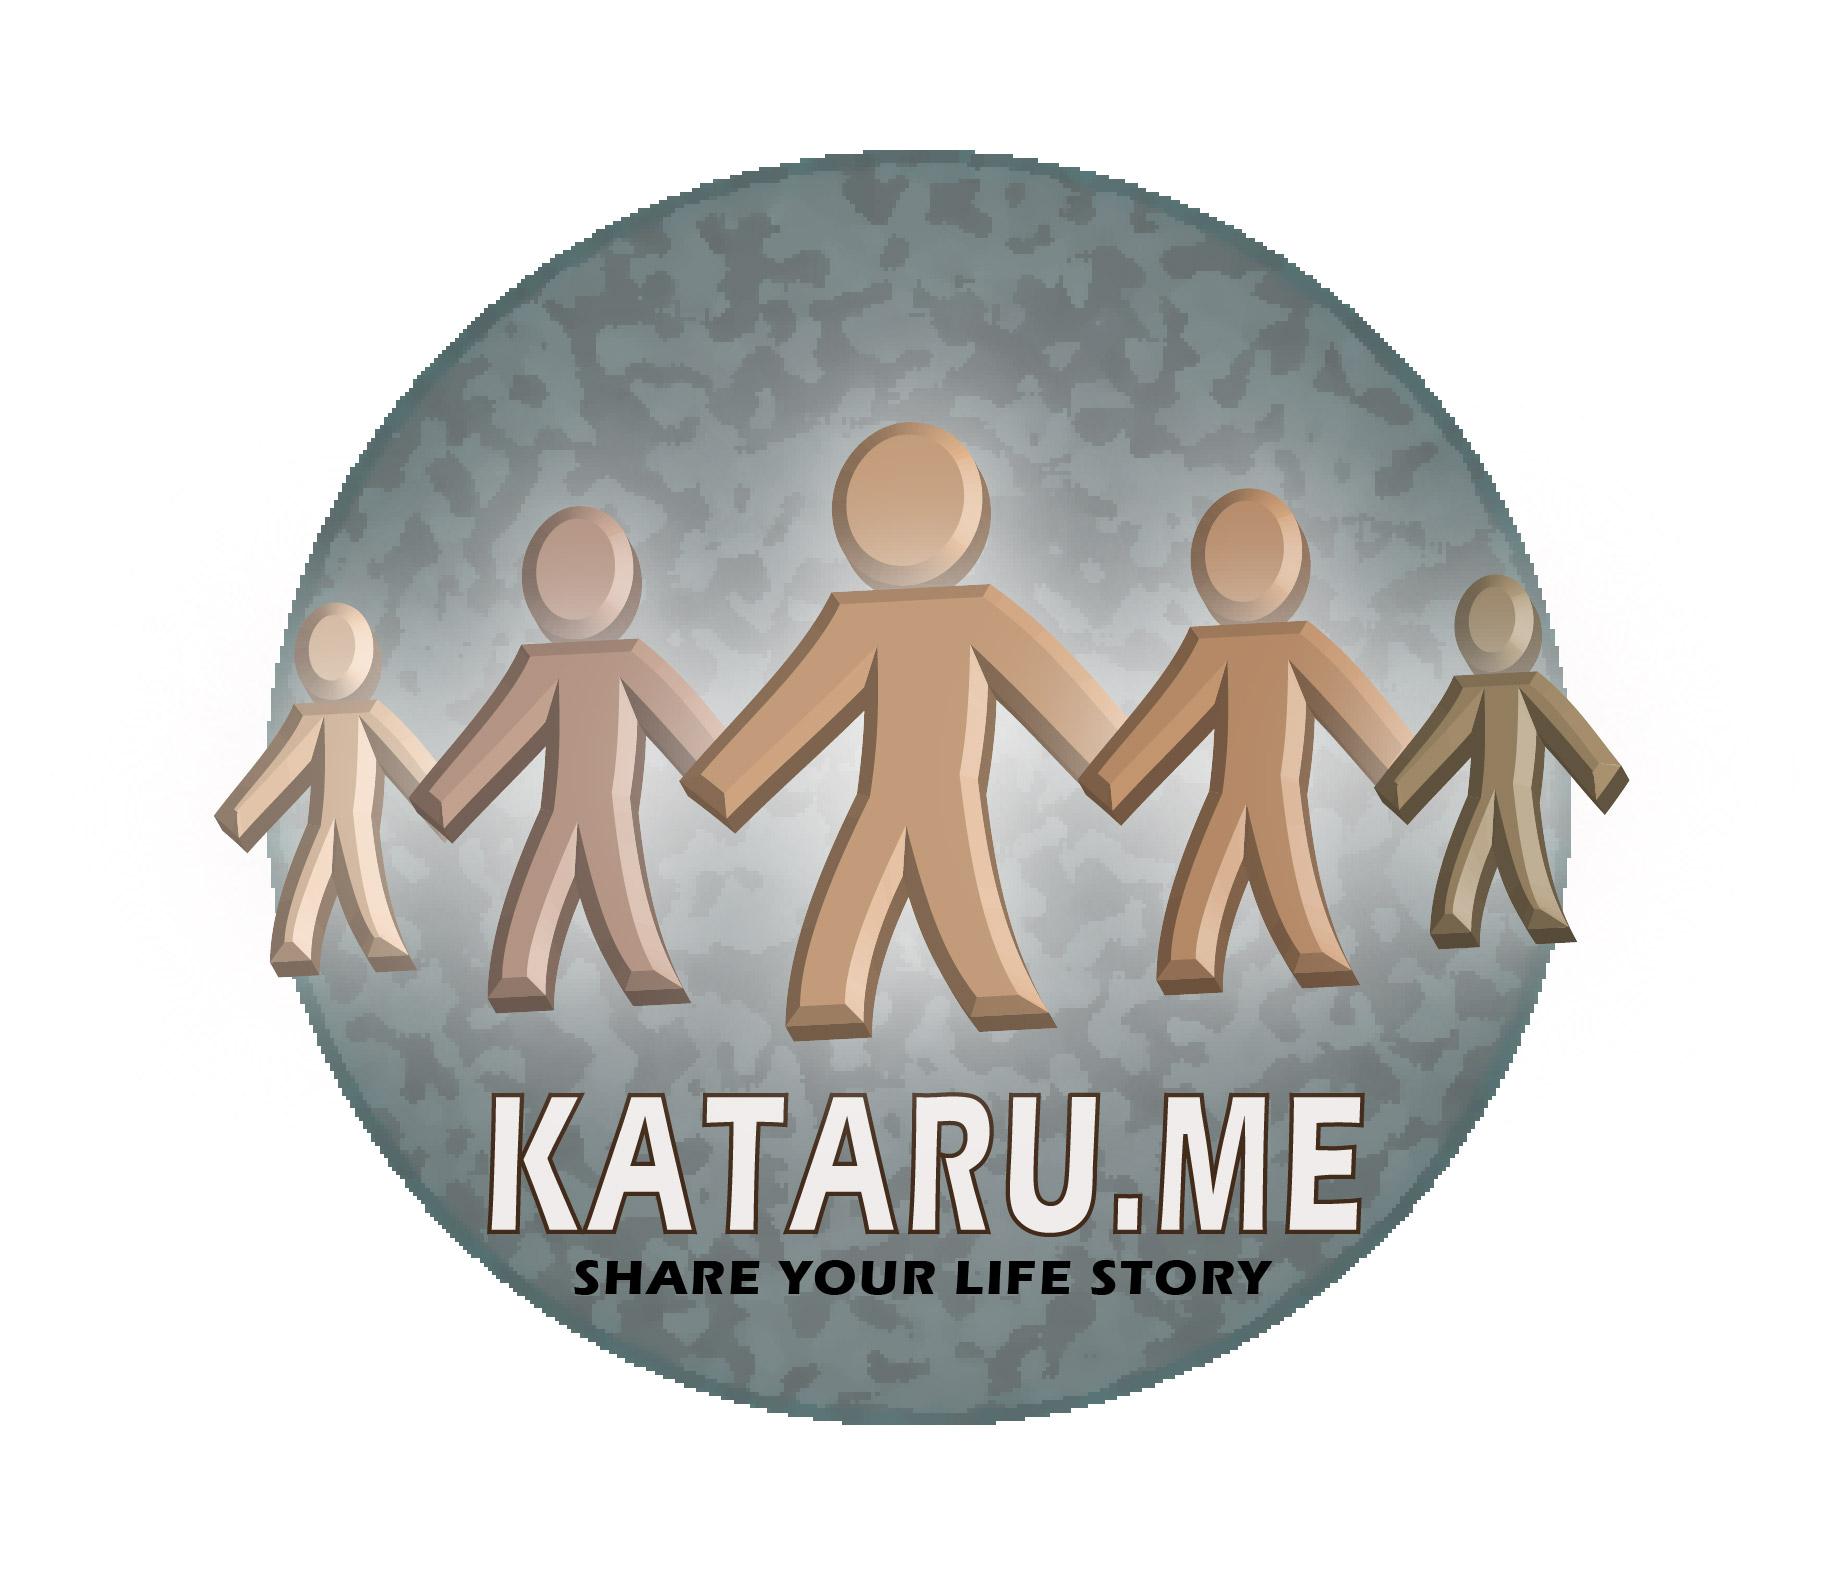 Logo Design by Susan Palmer - Entry No. 80 in the Logo Design Contest Inspiring Logo Design for KATARU.ME.